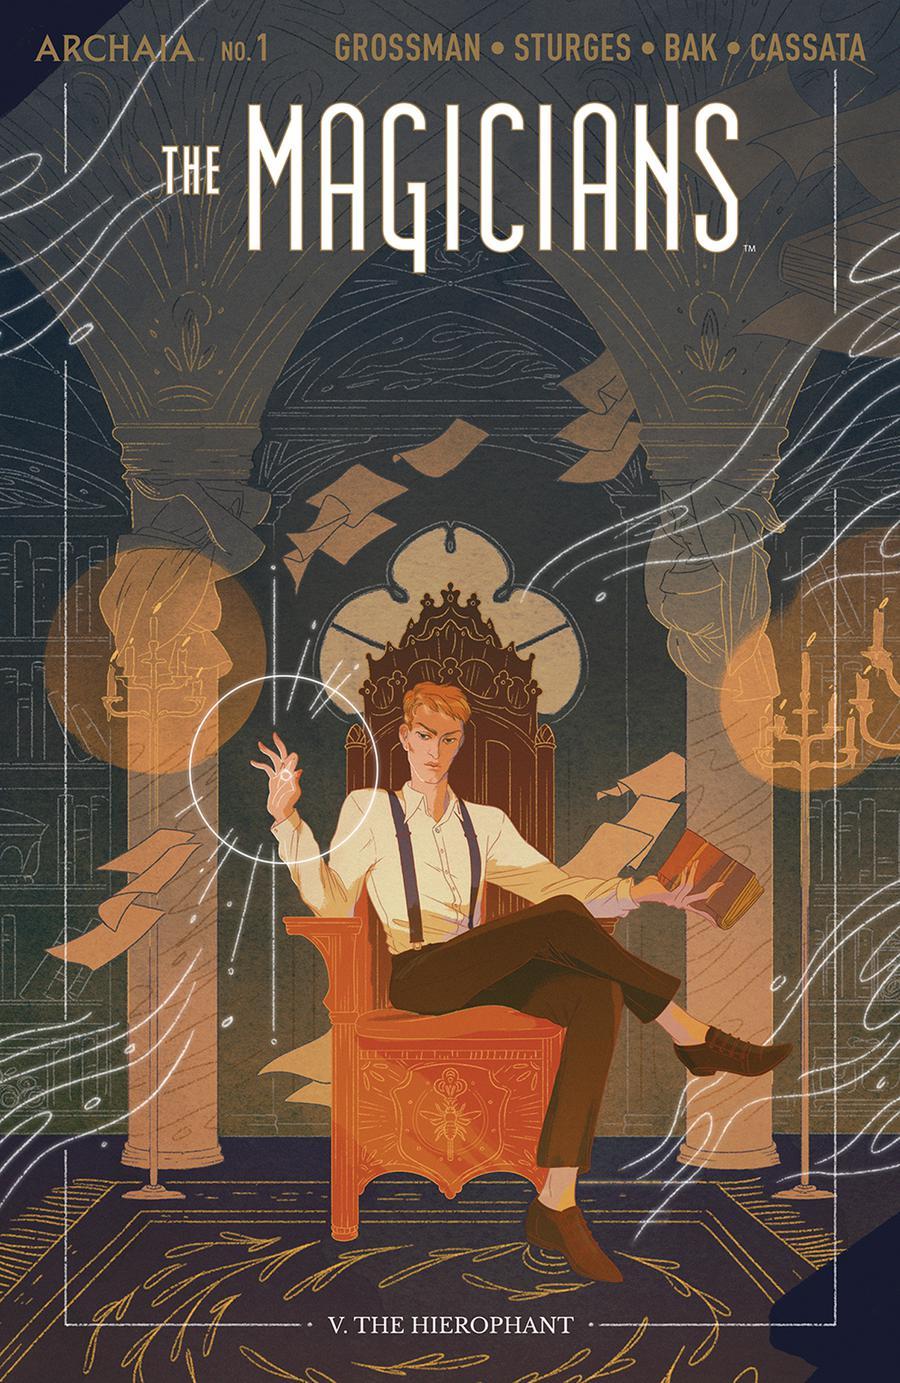 The Magicians #1 by Lev Grossman, Lilah Sturges